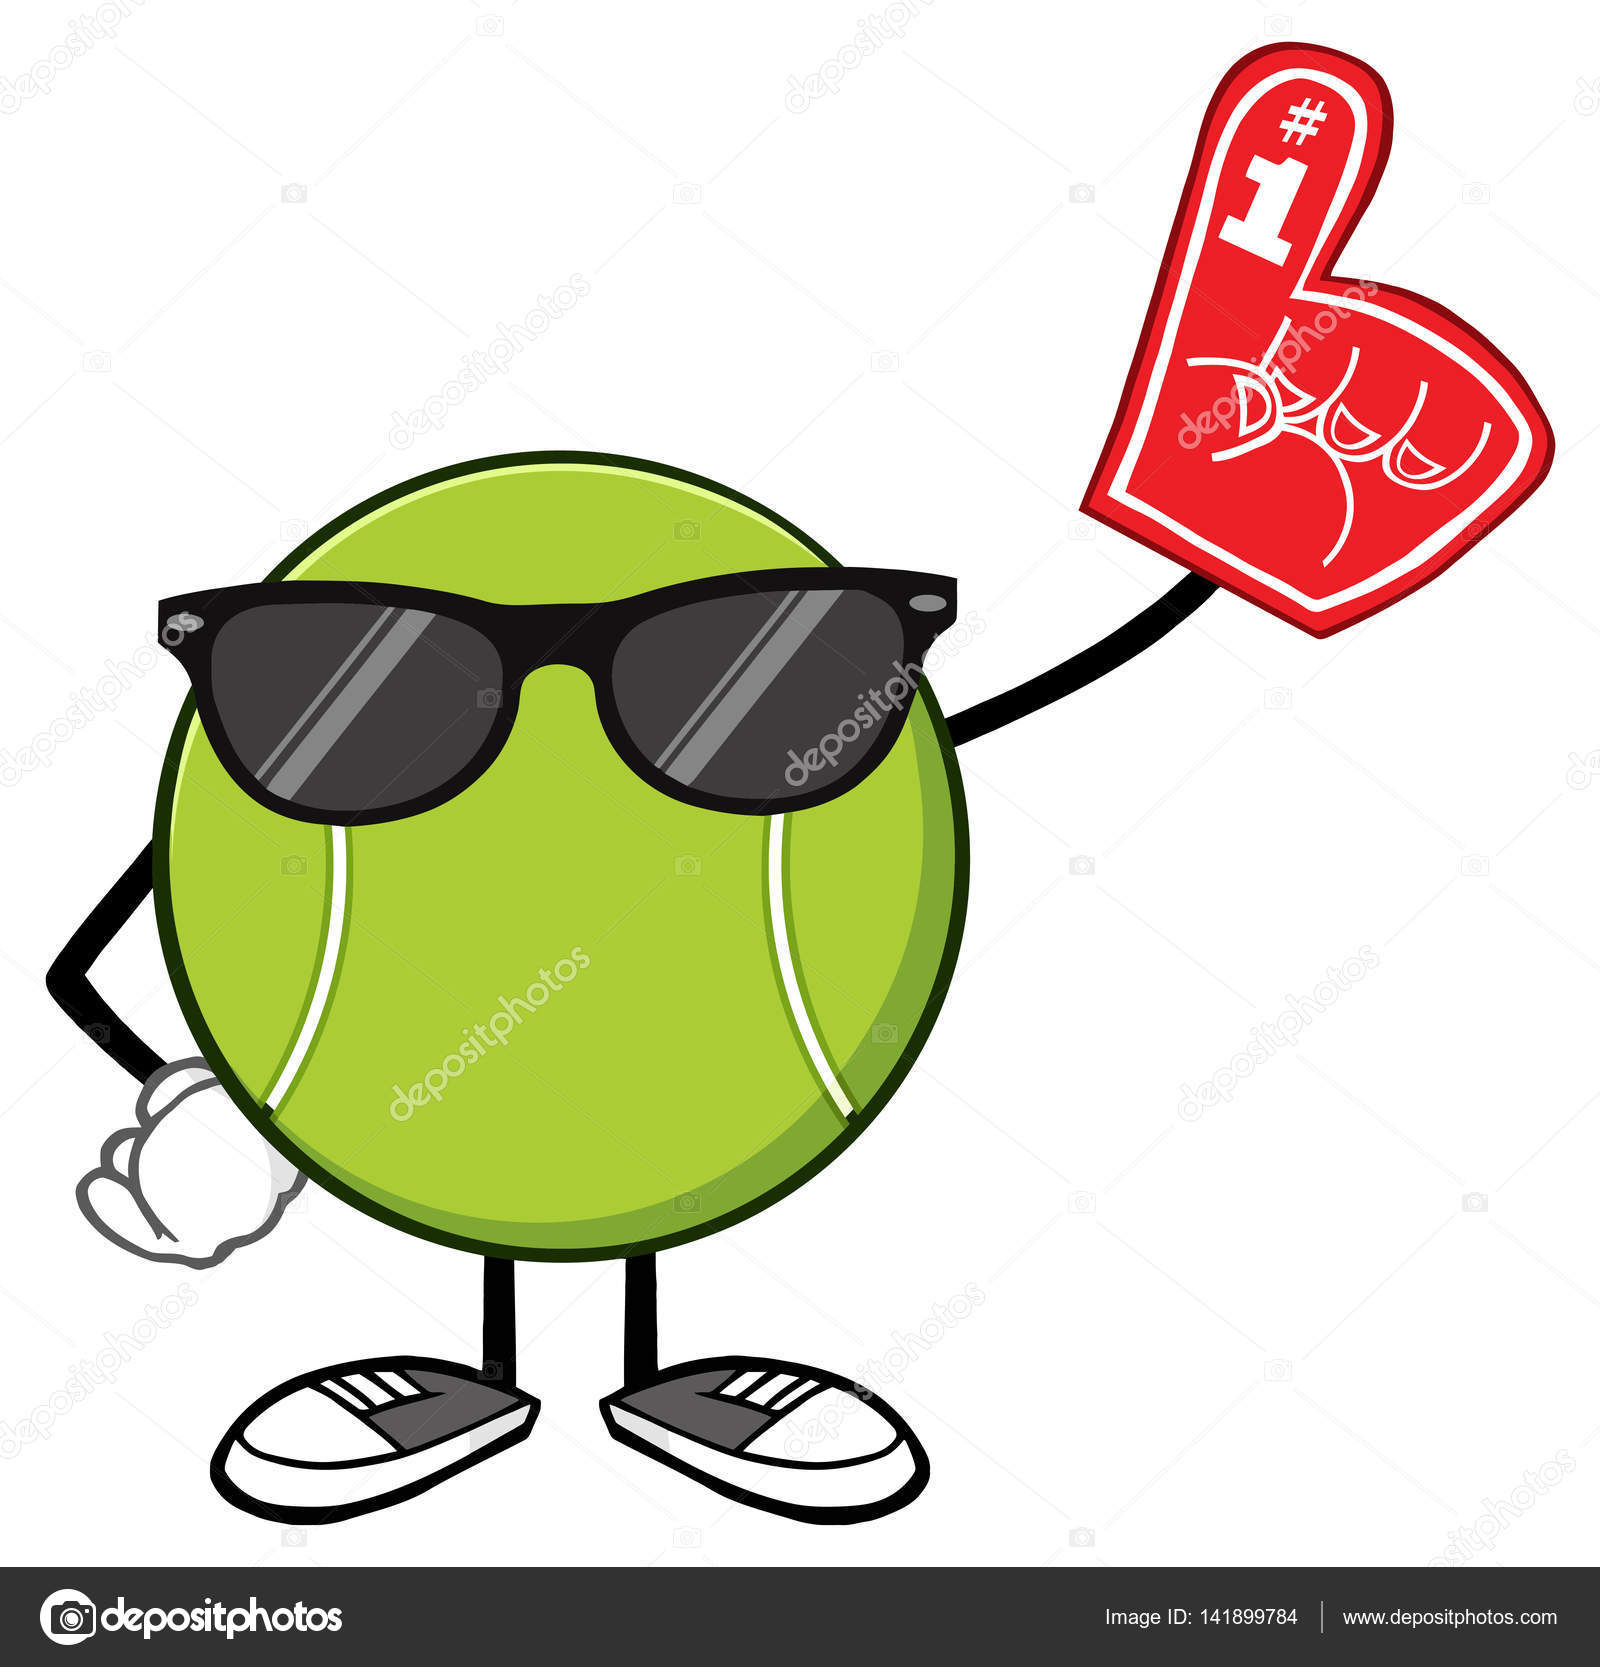 Tenis pelota stock de ilustracion ilustracion libre de stock de - Tenis Pelota Sin Rostro De La Historieta Mascota Personaje Con Gafas De Sol Con El Dedo De La Espuma Ilustraci N De Trama Aislada Sobre Fondo Blanco